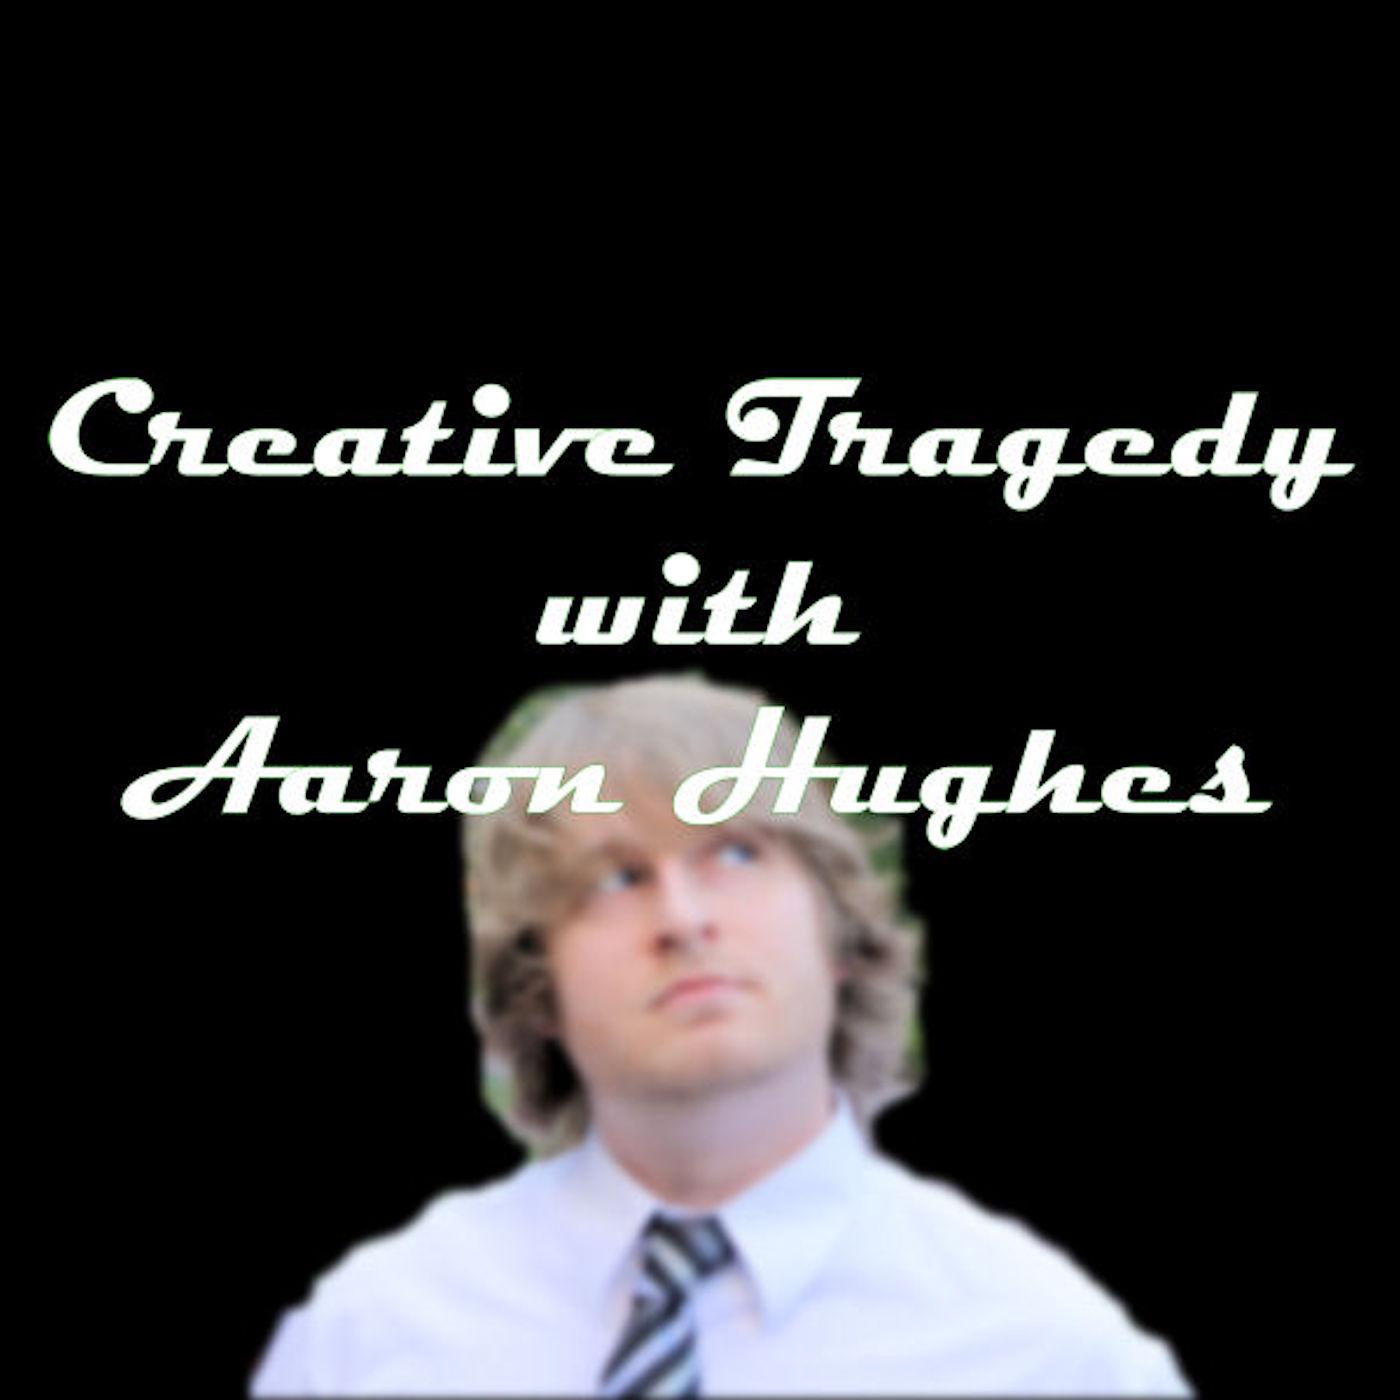 Creative Tragedy